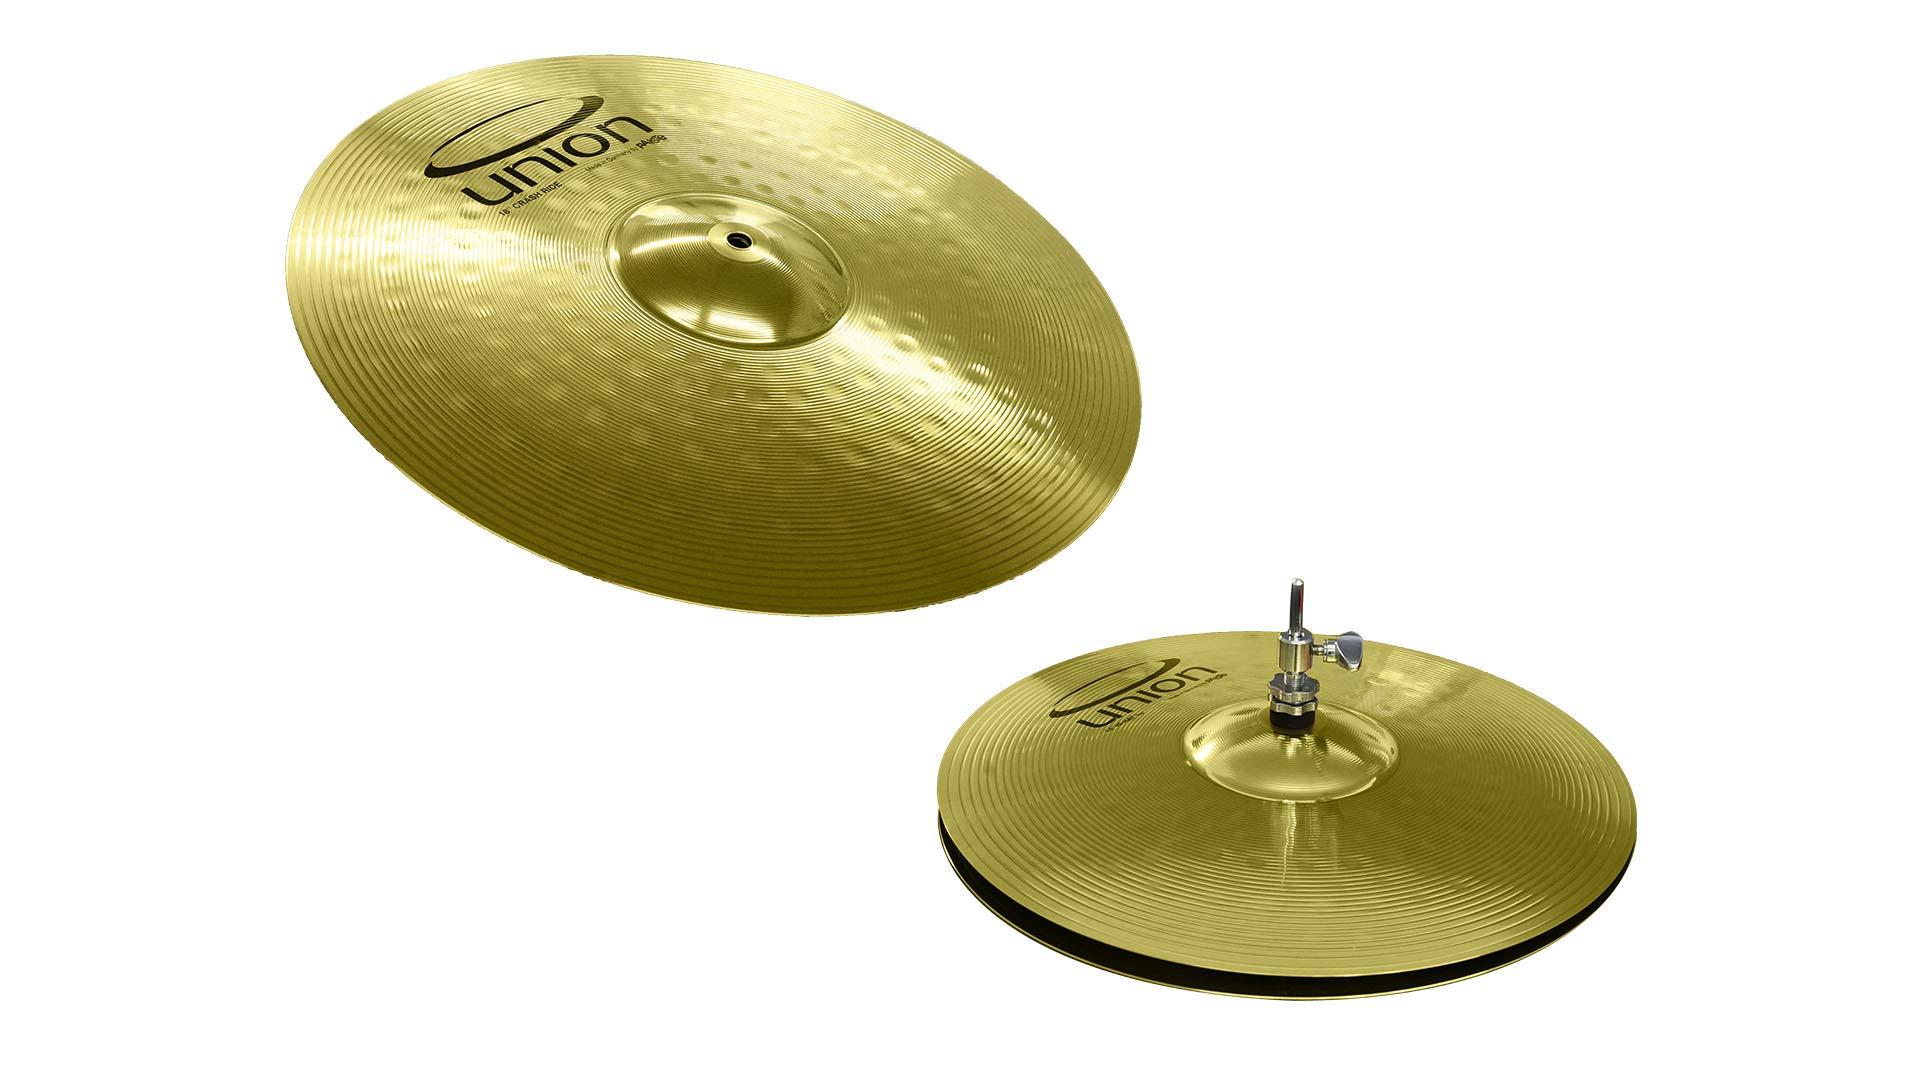 Union by Paiste 3-Piece Brass Cymbal Set - 14 inch Hi-Hats/18 inch Crash-Ride OEMBM2KP